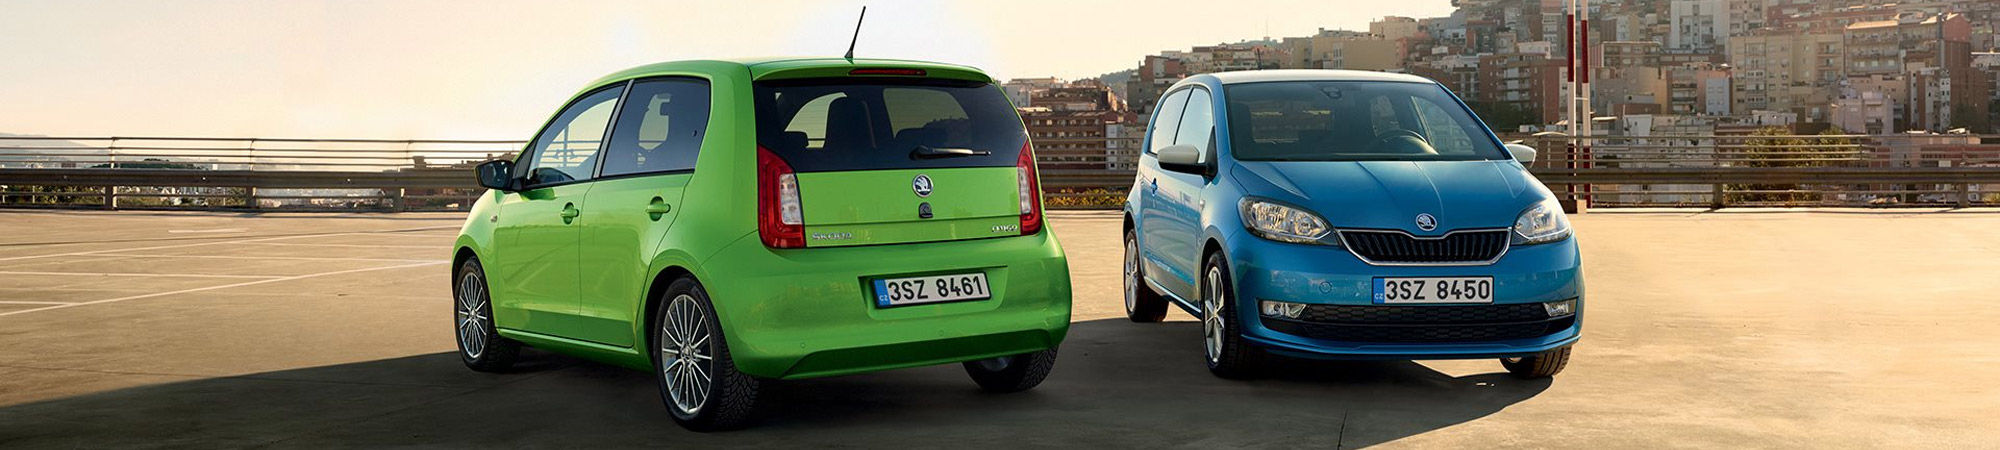 Kokoaan tilavampi Škoda Citigo